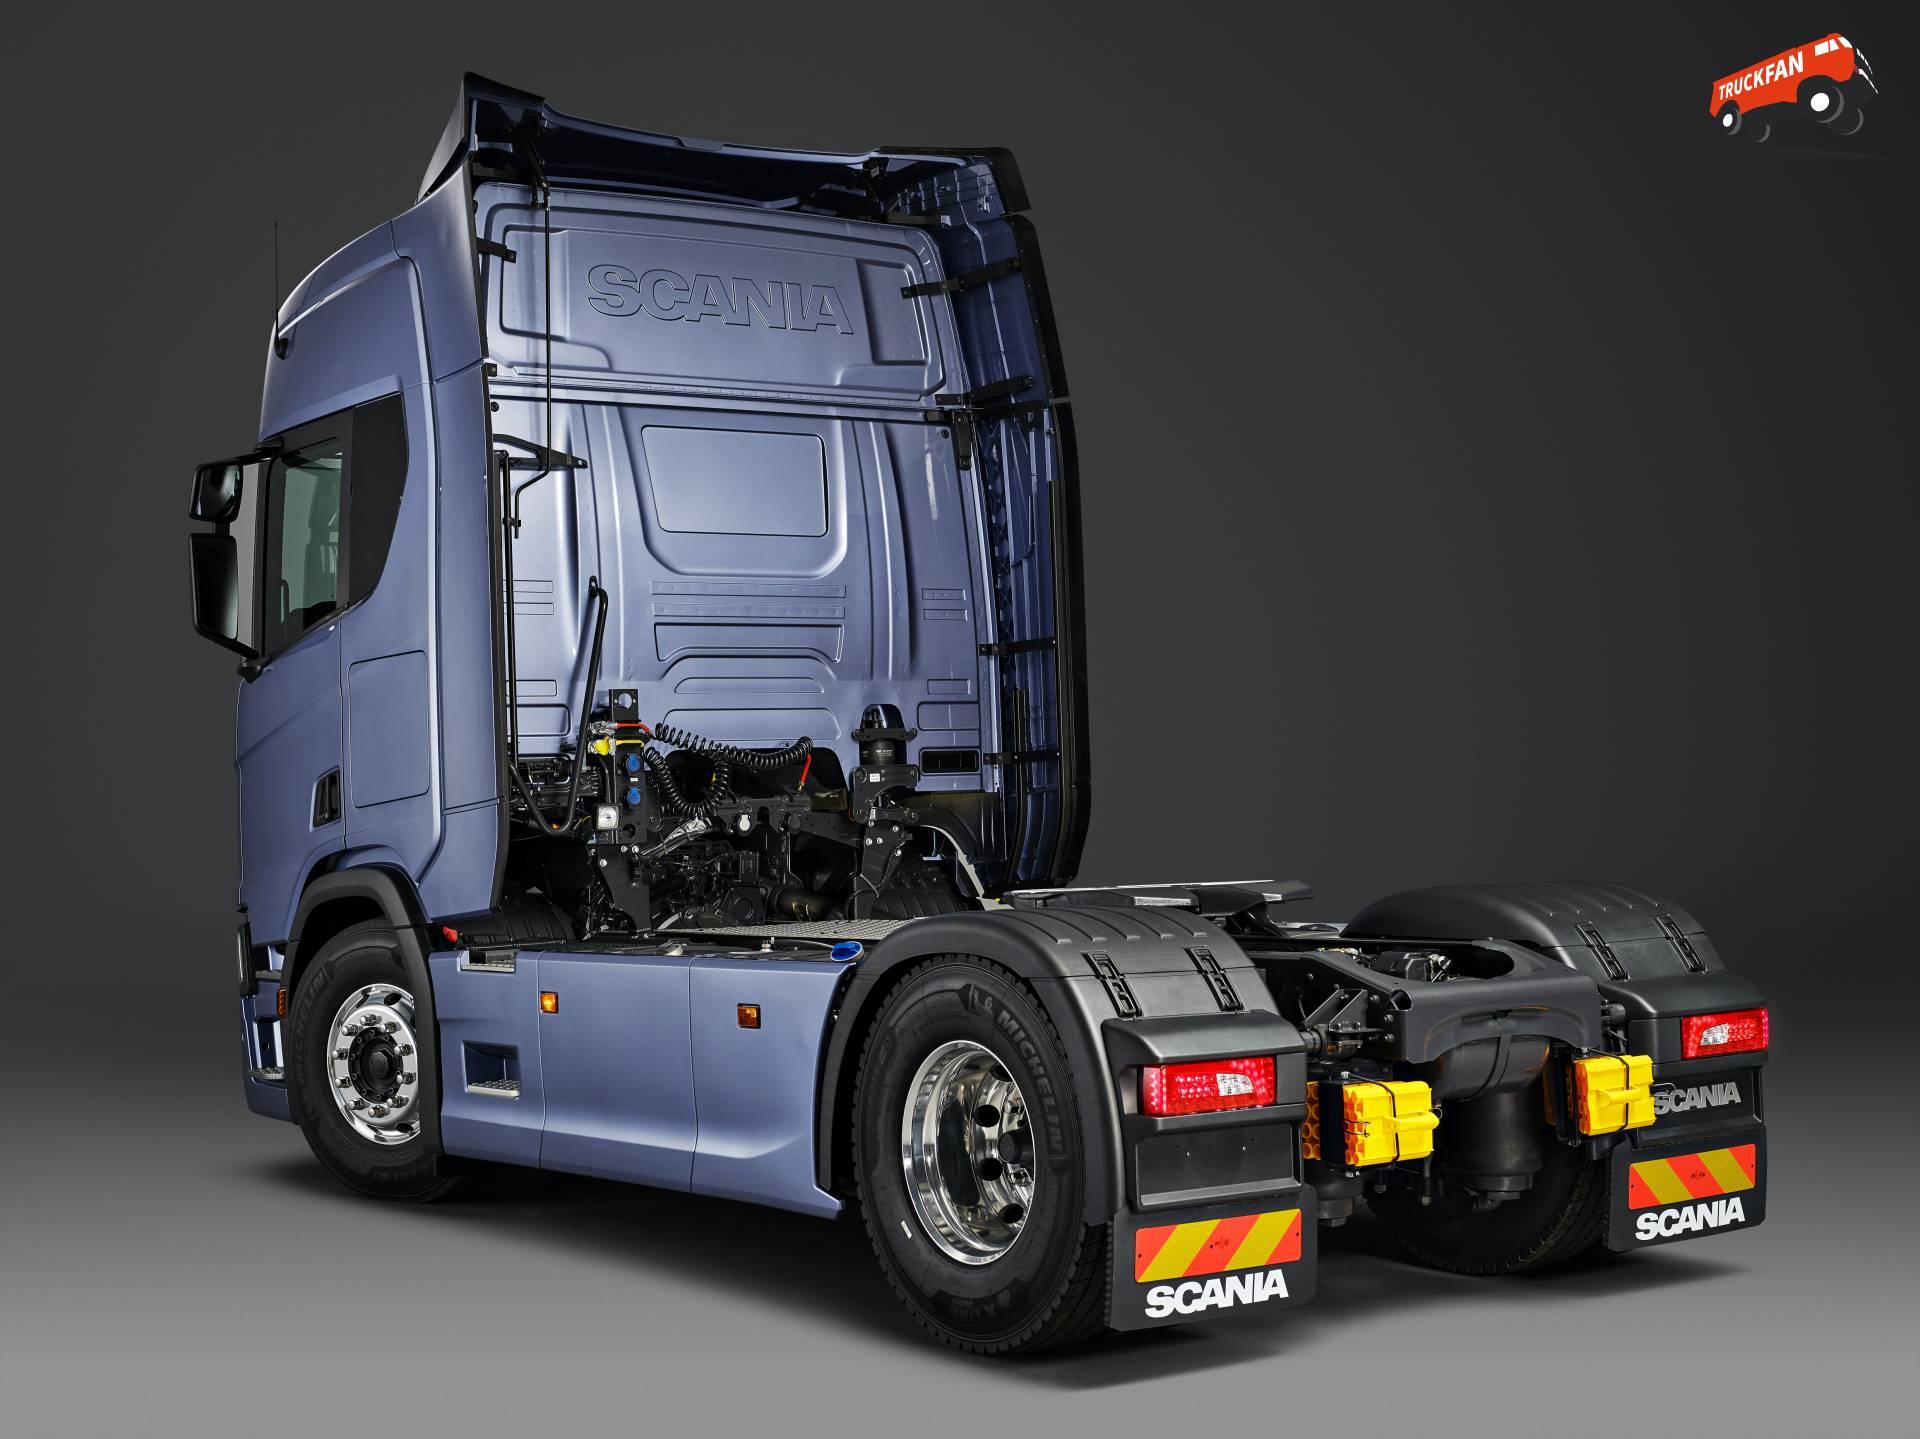 Scania Trucks 2016 New Images